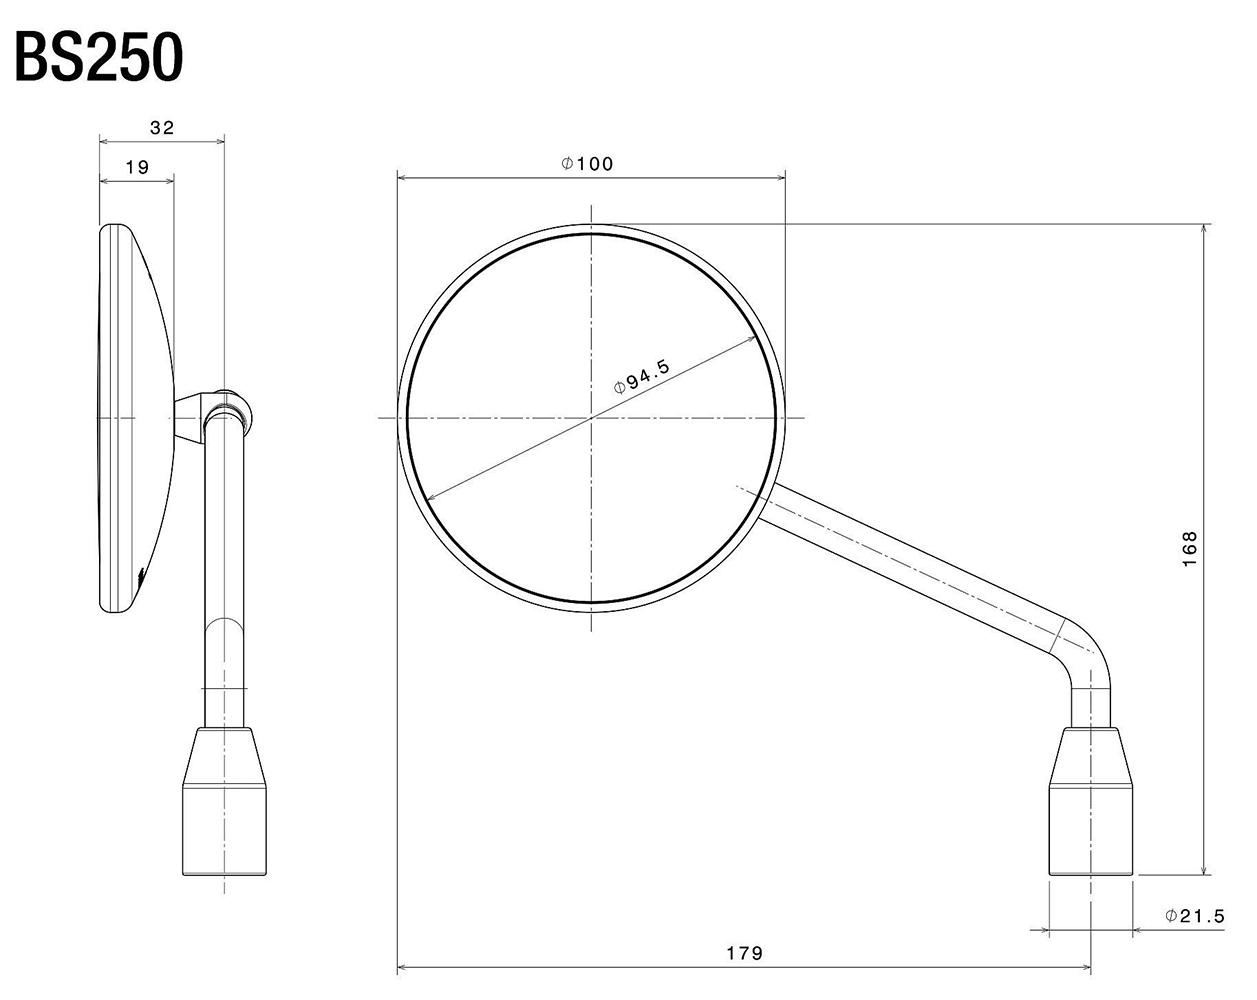 hight resolution of aprilium mana 850 wiring diagram